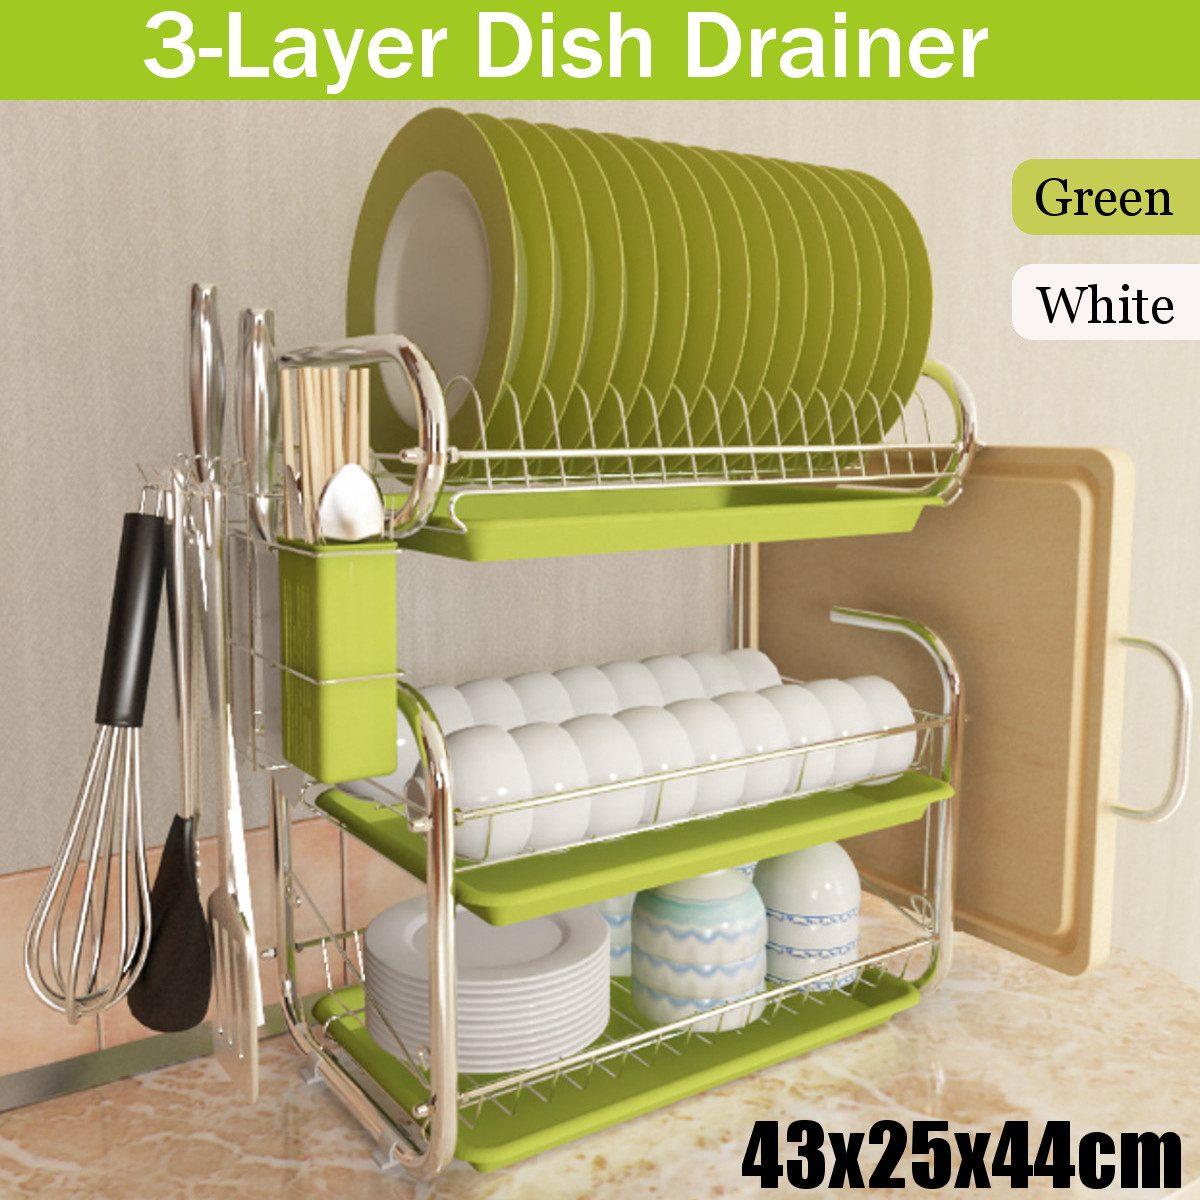 3 Tiers Dish Drainer Stainless Kitchen Dish Rack Storage Shelf Washing Holder Basket Plated Knife Sink Drying Organizer Tools